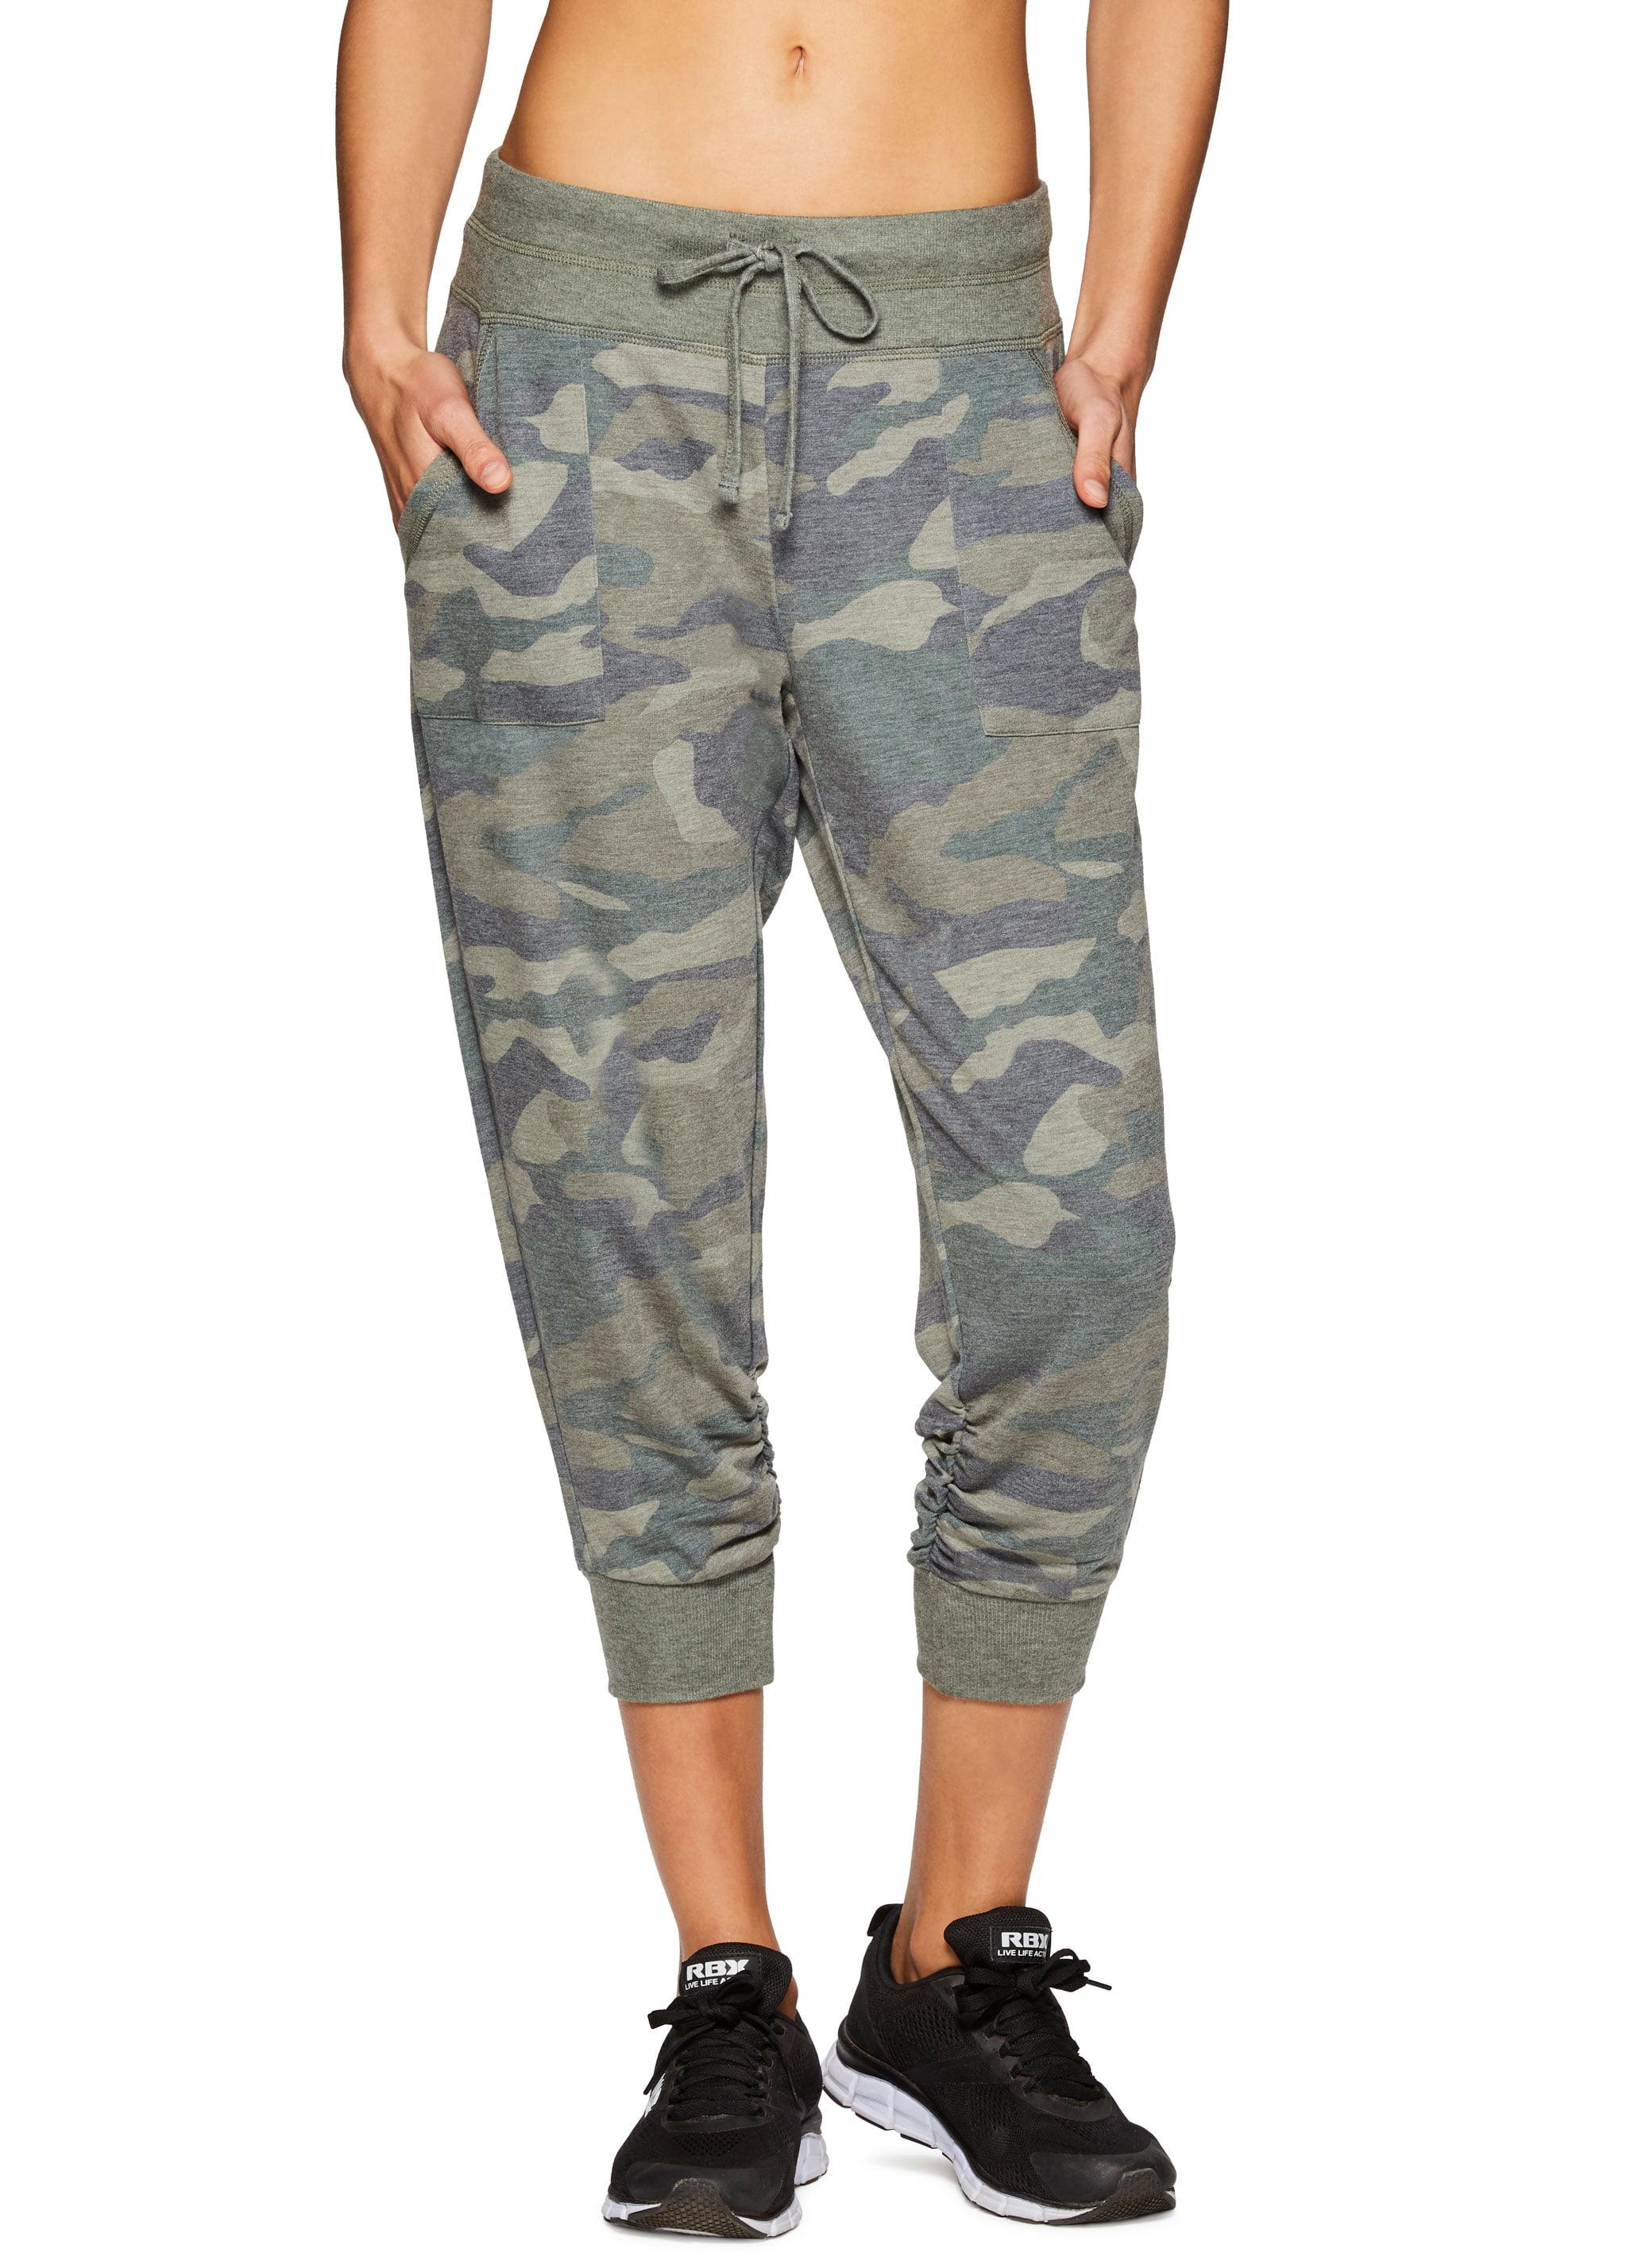 SUPEYA Baby Girls Pineapple Print Tanks Shirts+Short Pants+Headband 3Pcs Set